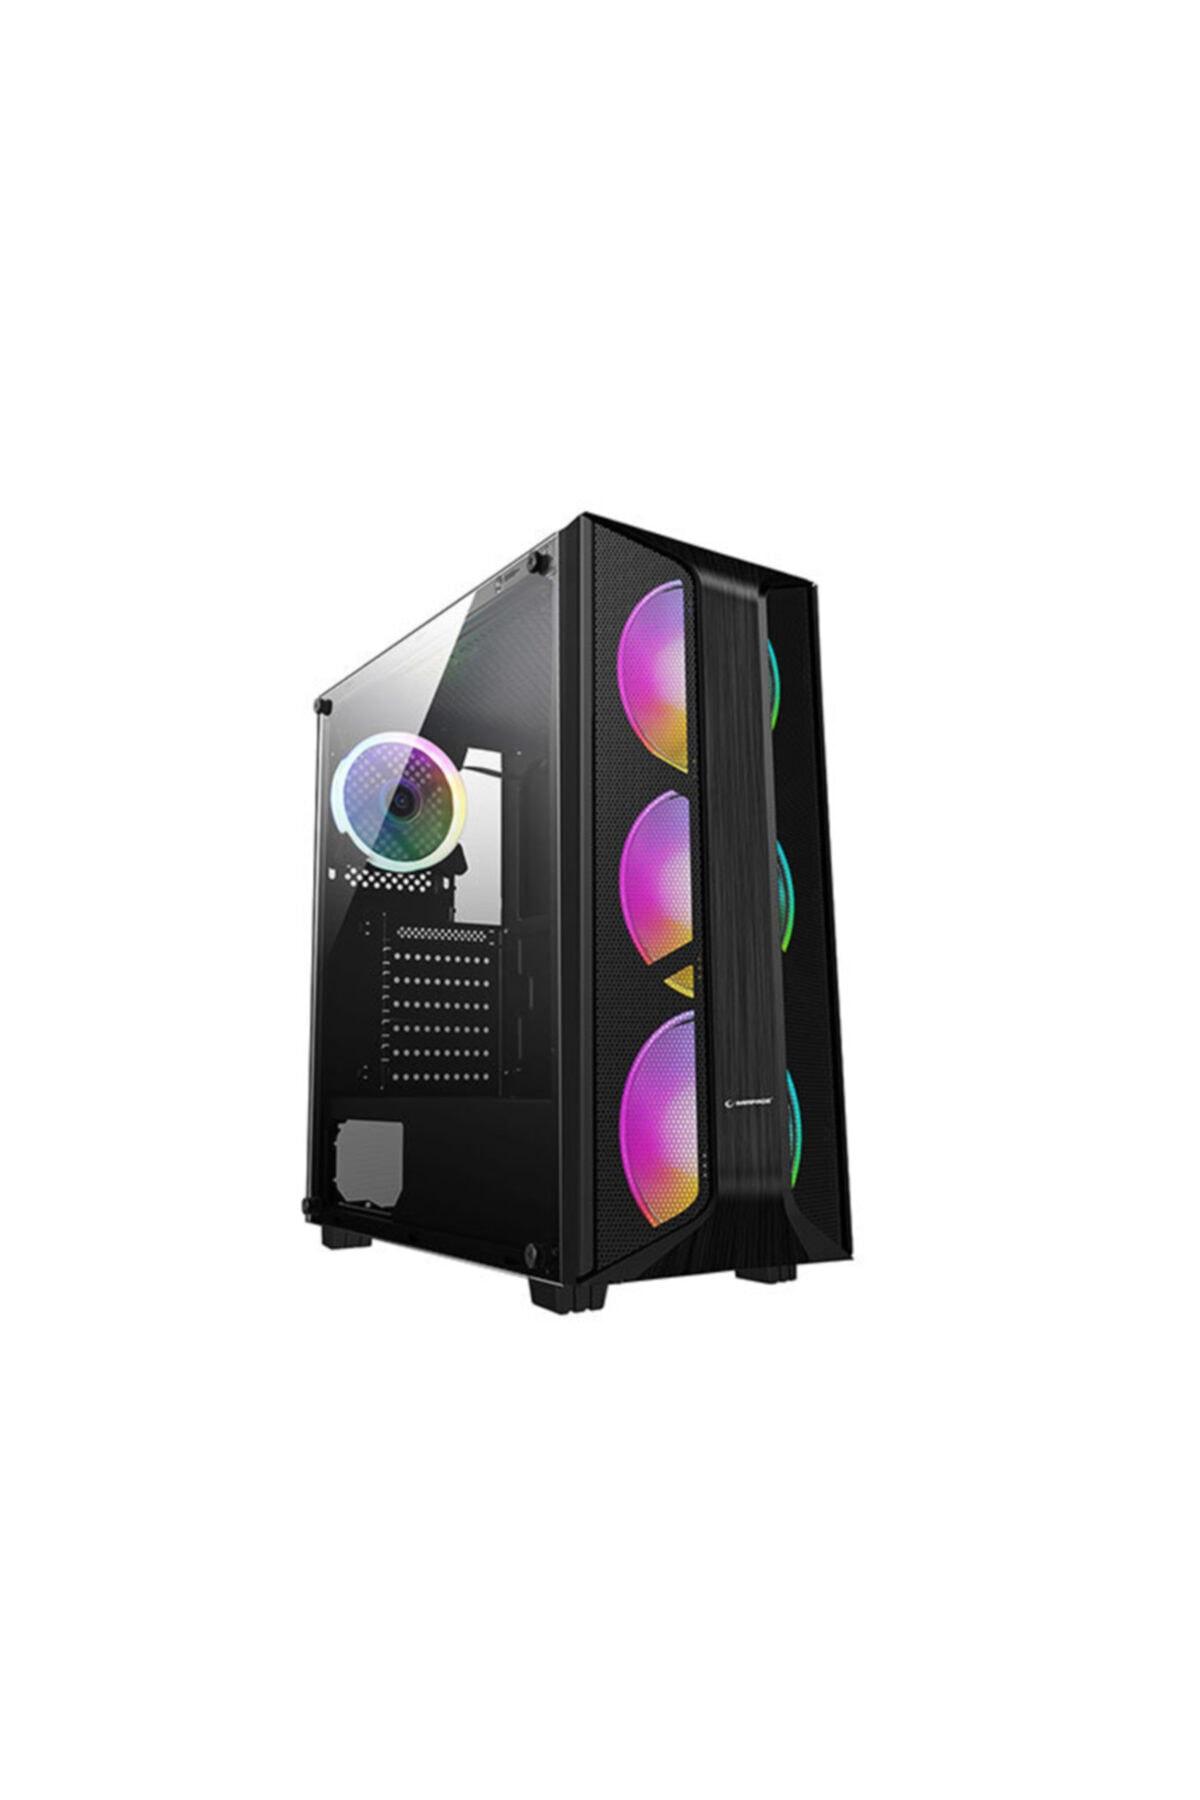 Saılor Temper Camlı 600w 80 Plus Bronze Siyah 4*12cm Rainbow Fanlı Gaming Oyuncu Kasası